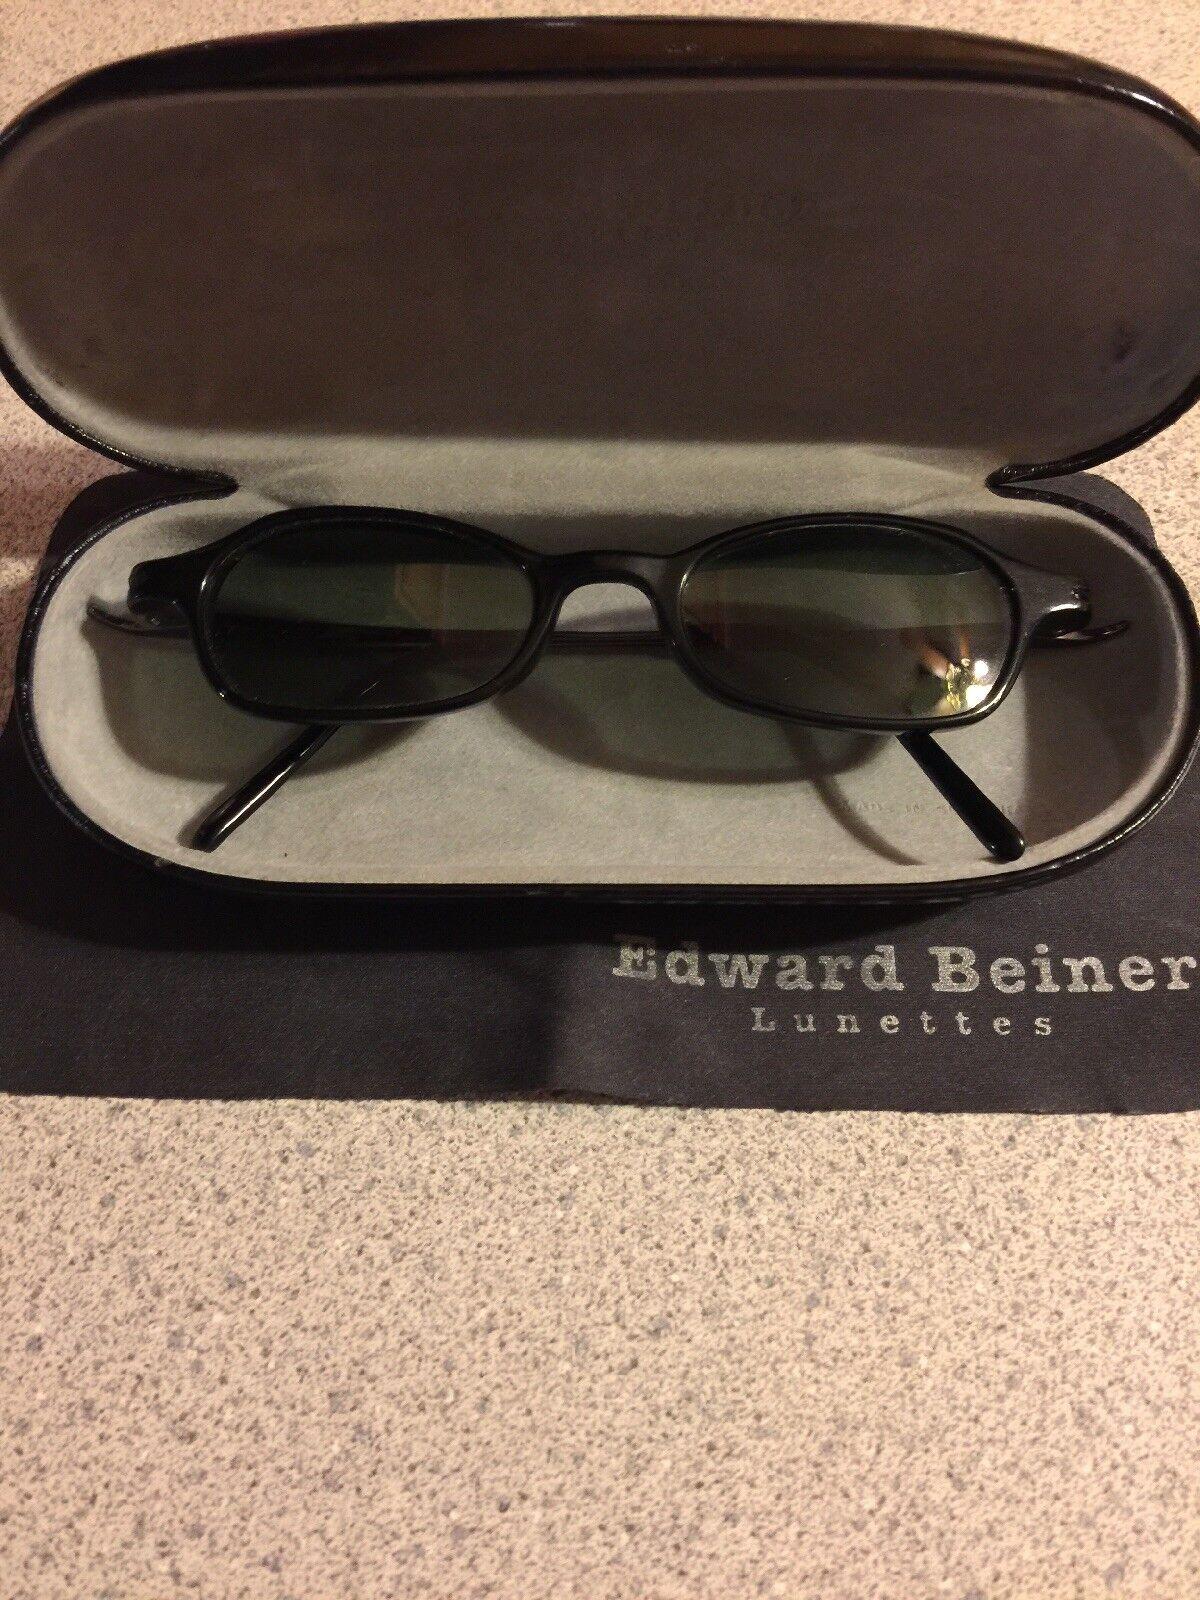 EDWARD BEINER NOS EB-085 BLK 46-19 140 CE MADE IN JAPAN With CASE.